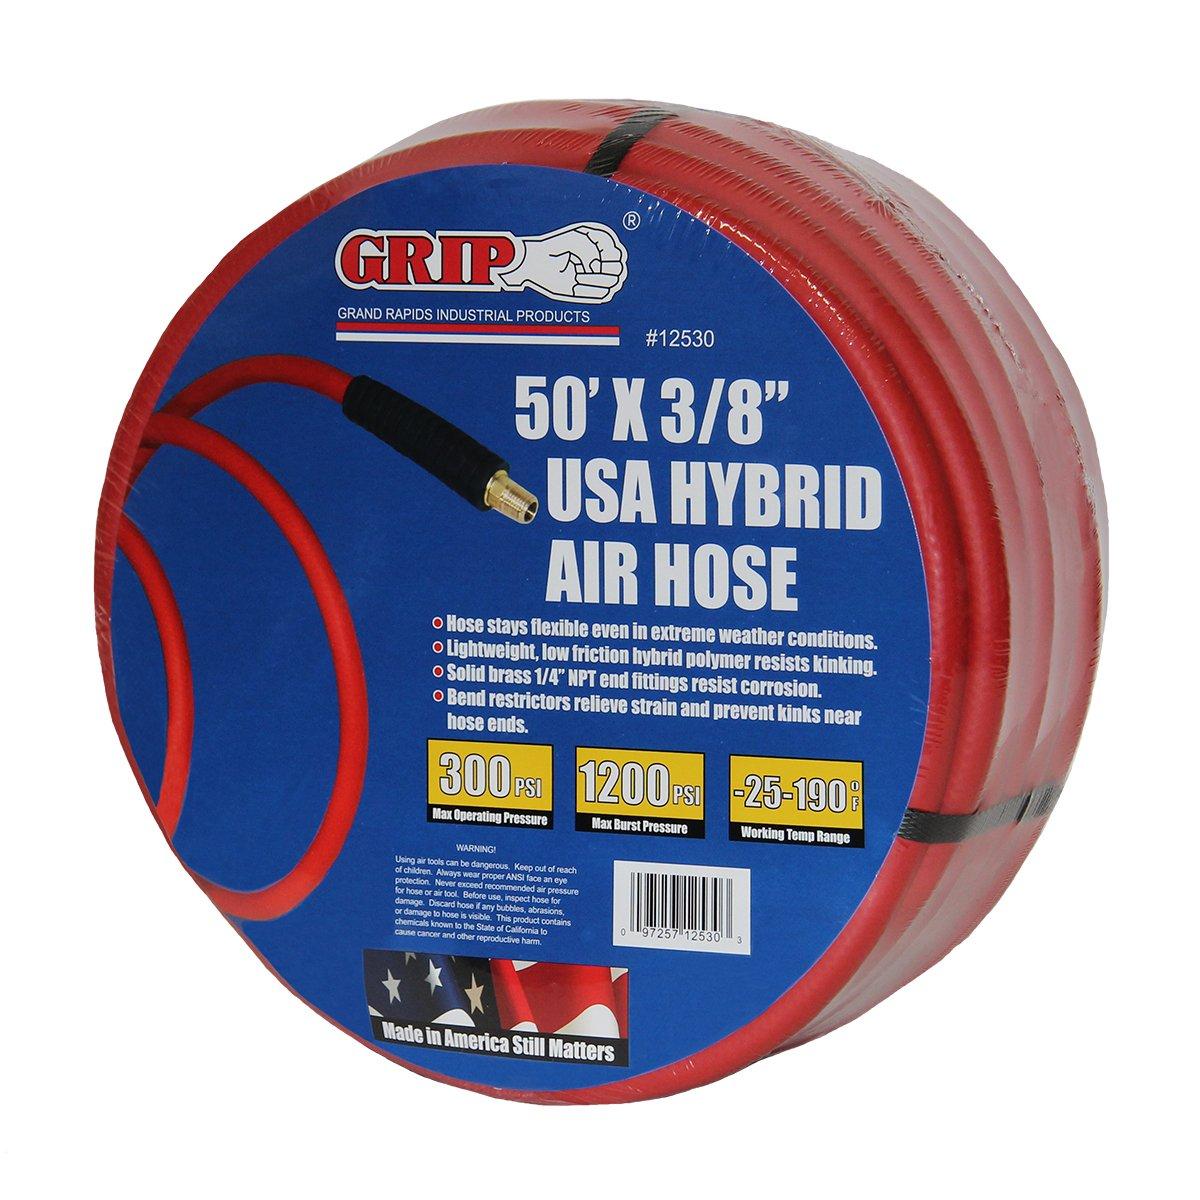 Red GRAND RAPIDS INDUSTRIAL GRIP 12530 50 x 3//8 USA Hybrid Air Hose